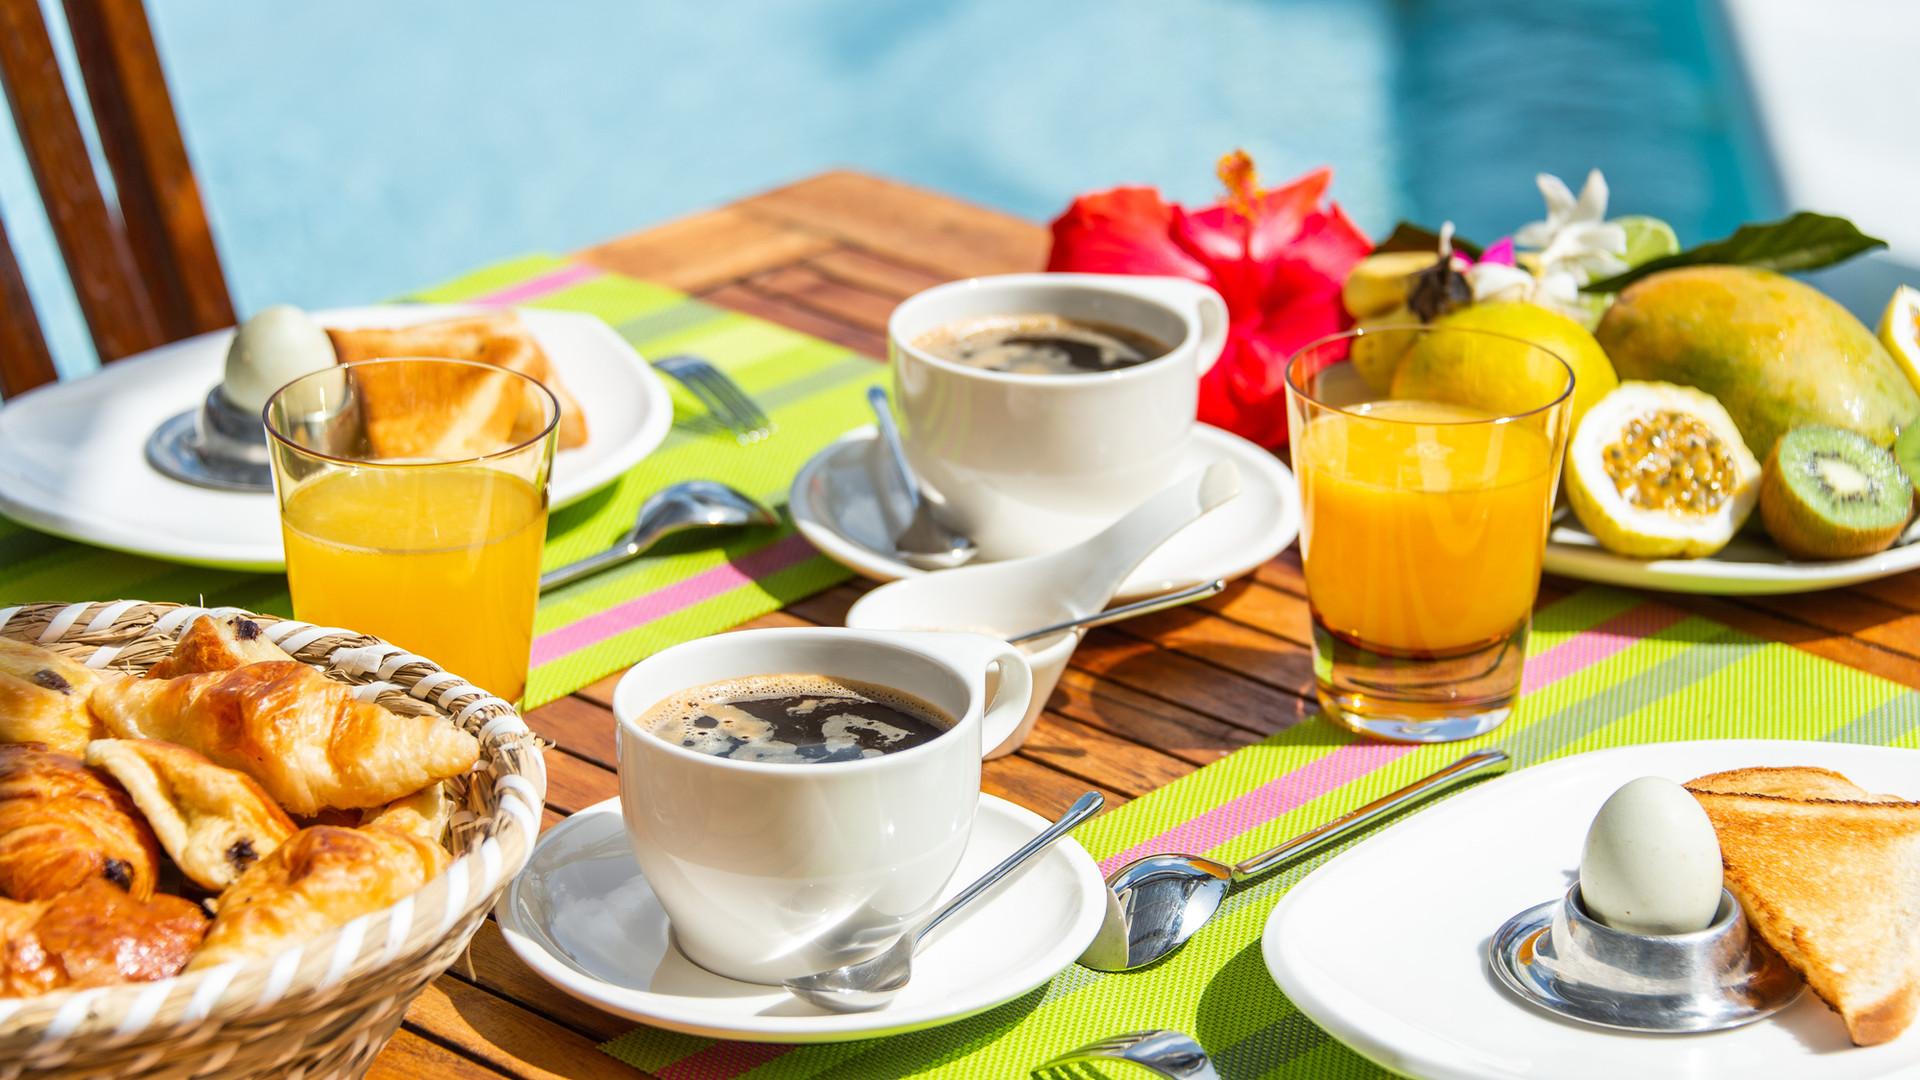 breakfast_cafeÌ_croissant_fruit_oe